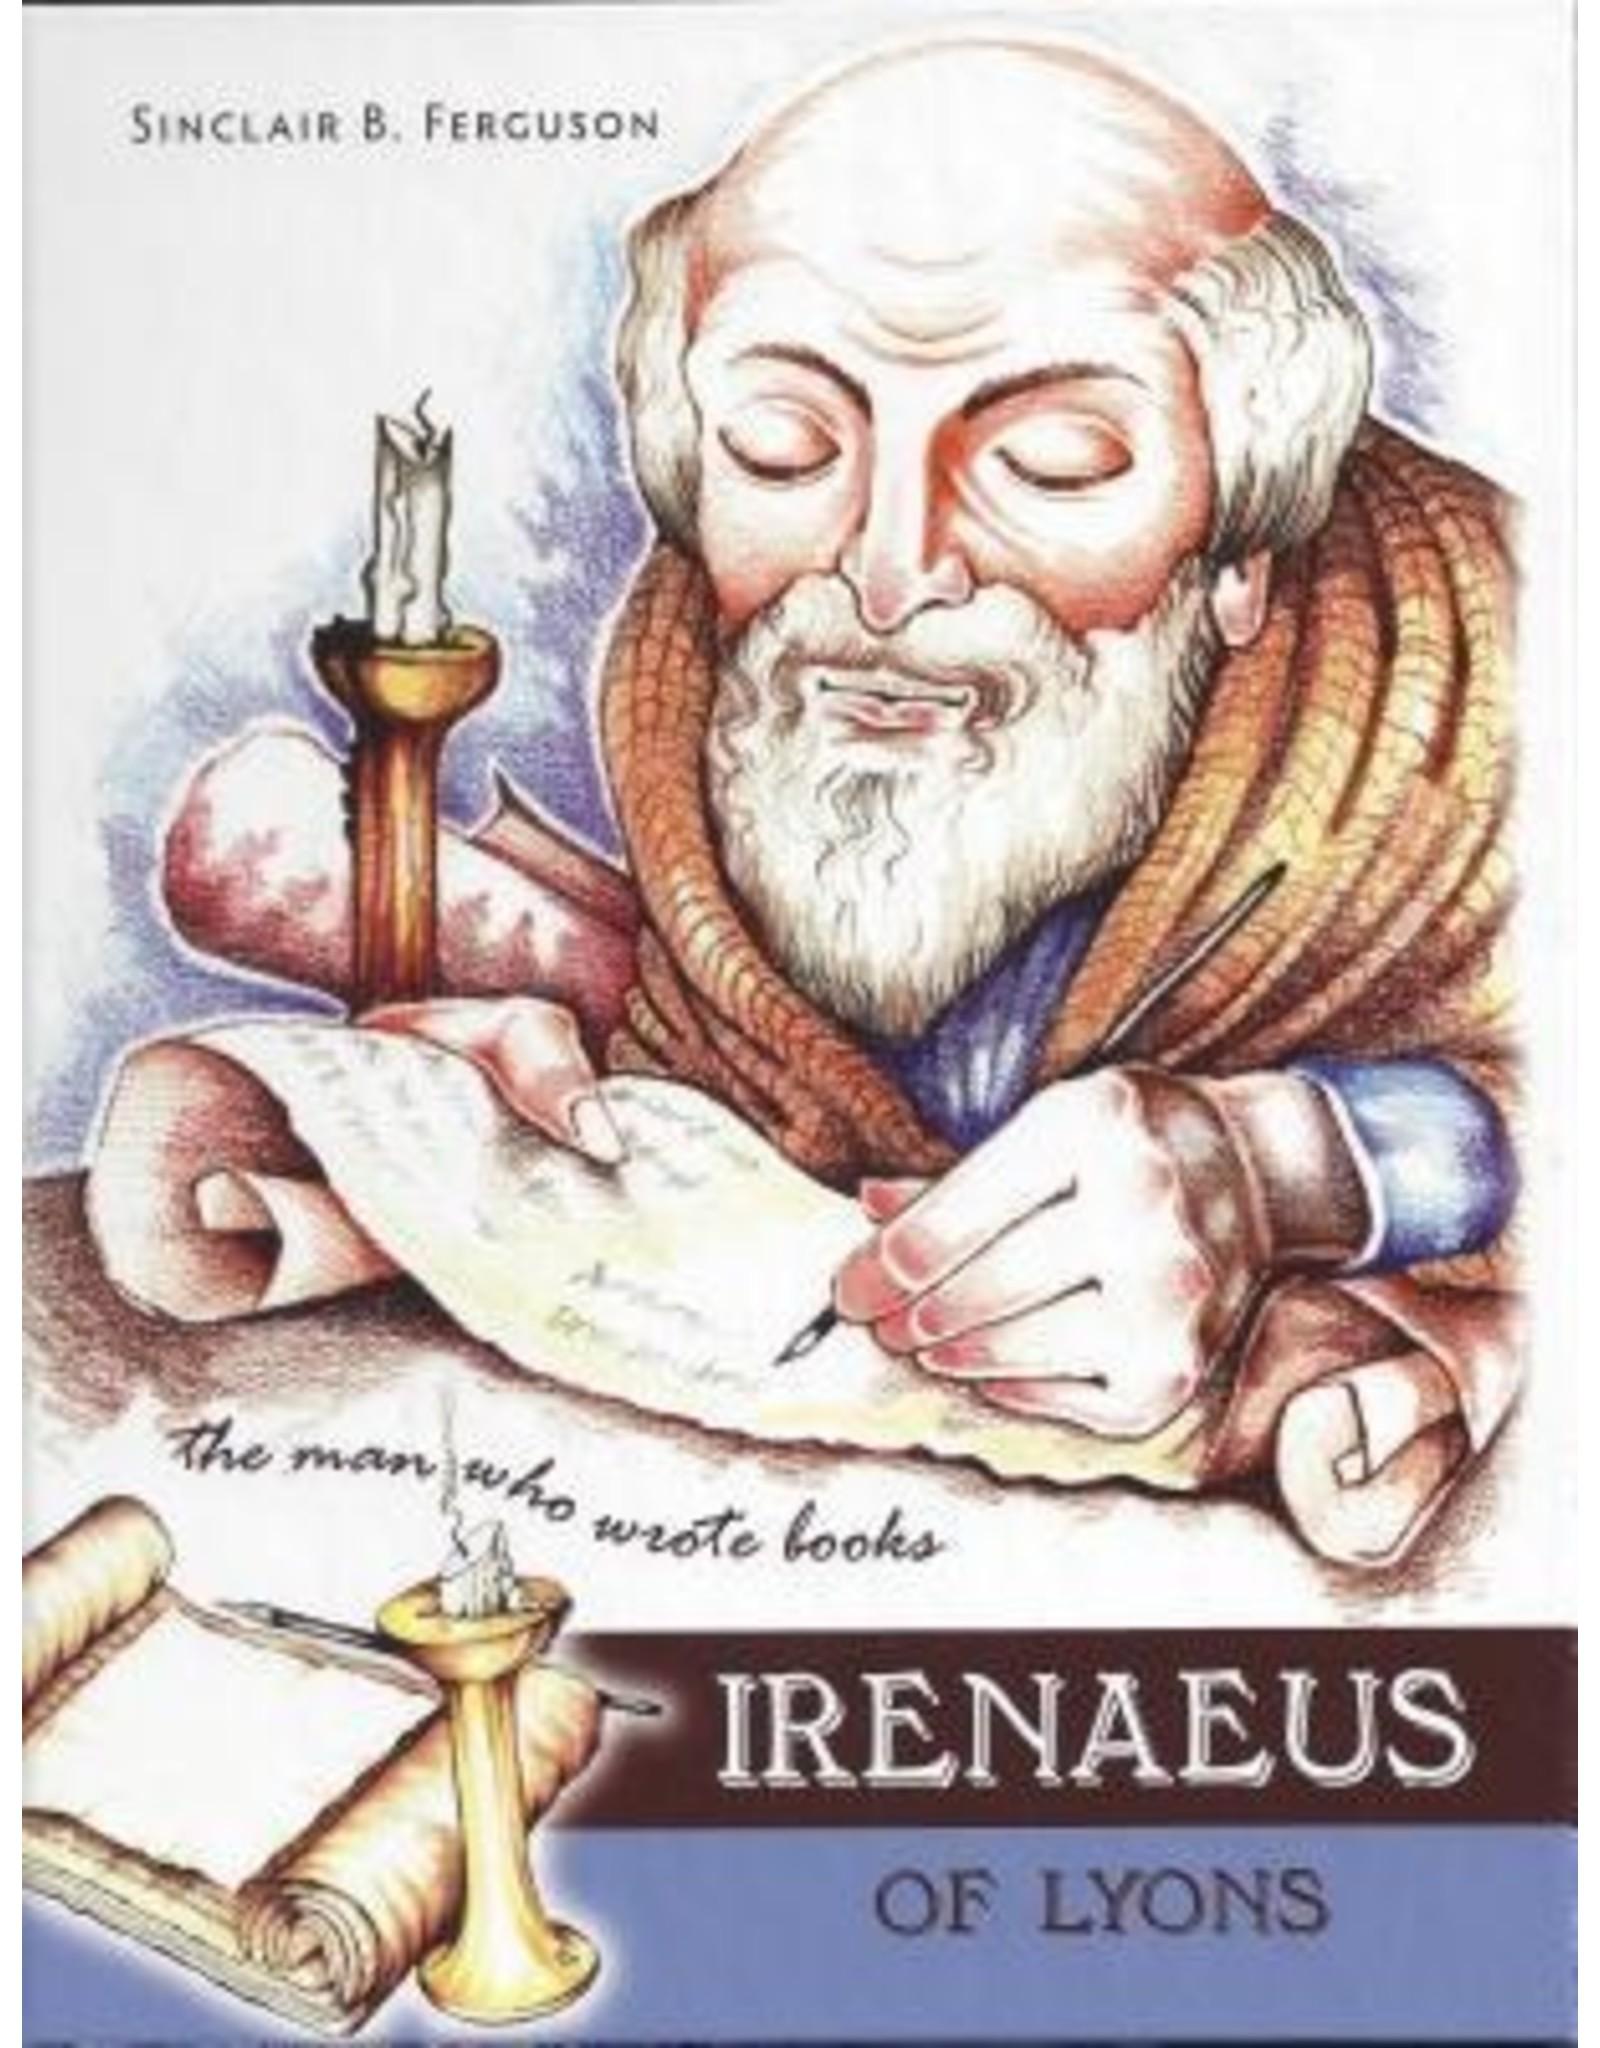 Ferguson Irenaeus of Lyons